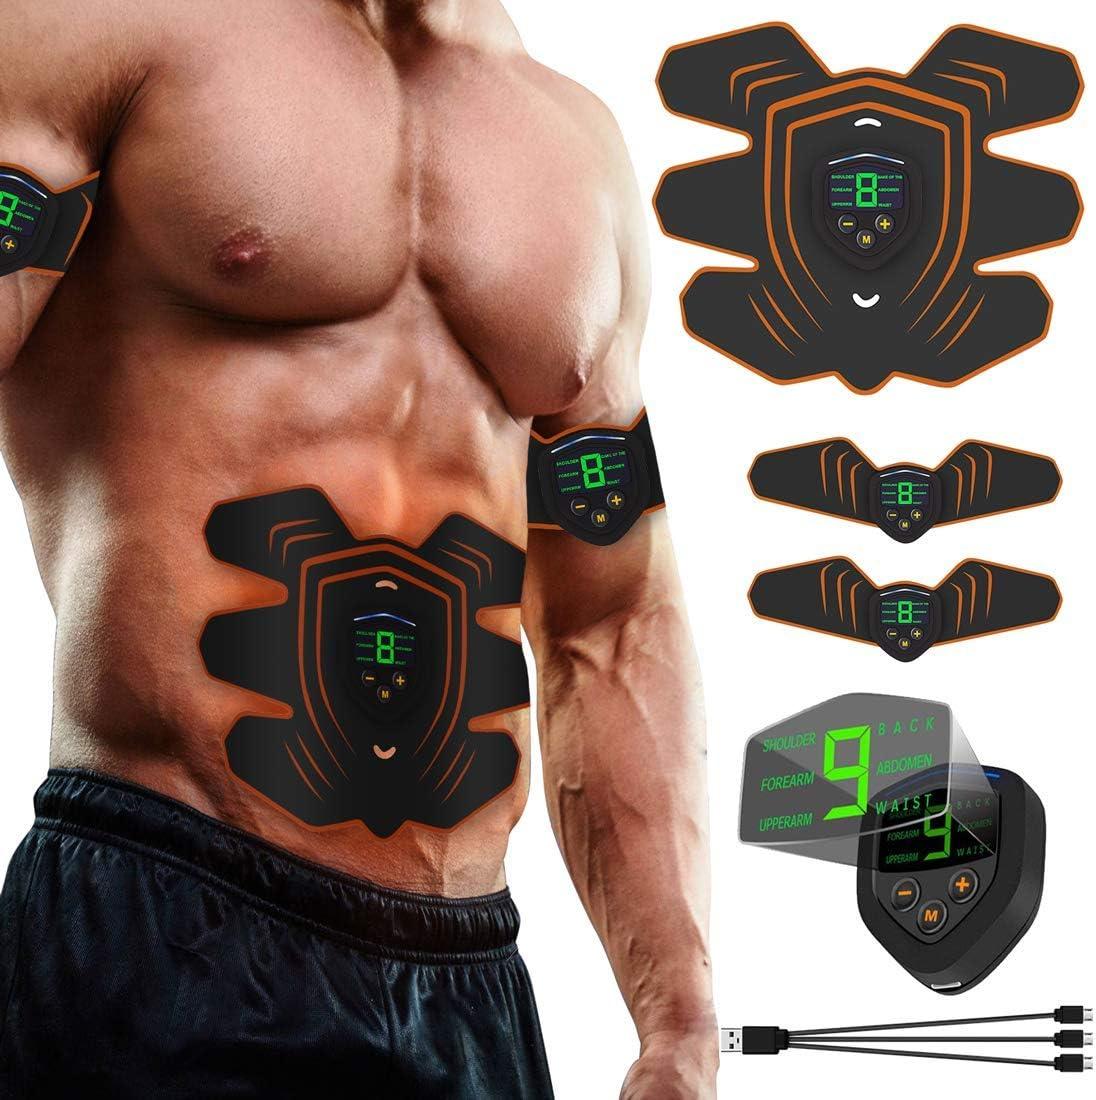 A-TION EMS Muscle Stimulator Abs Trainer Toner 8 Pads Belt Fitness For Men Women